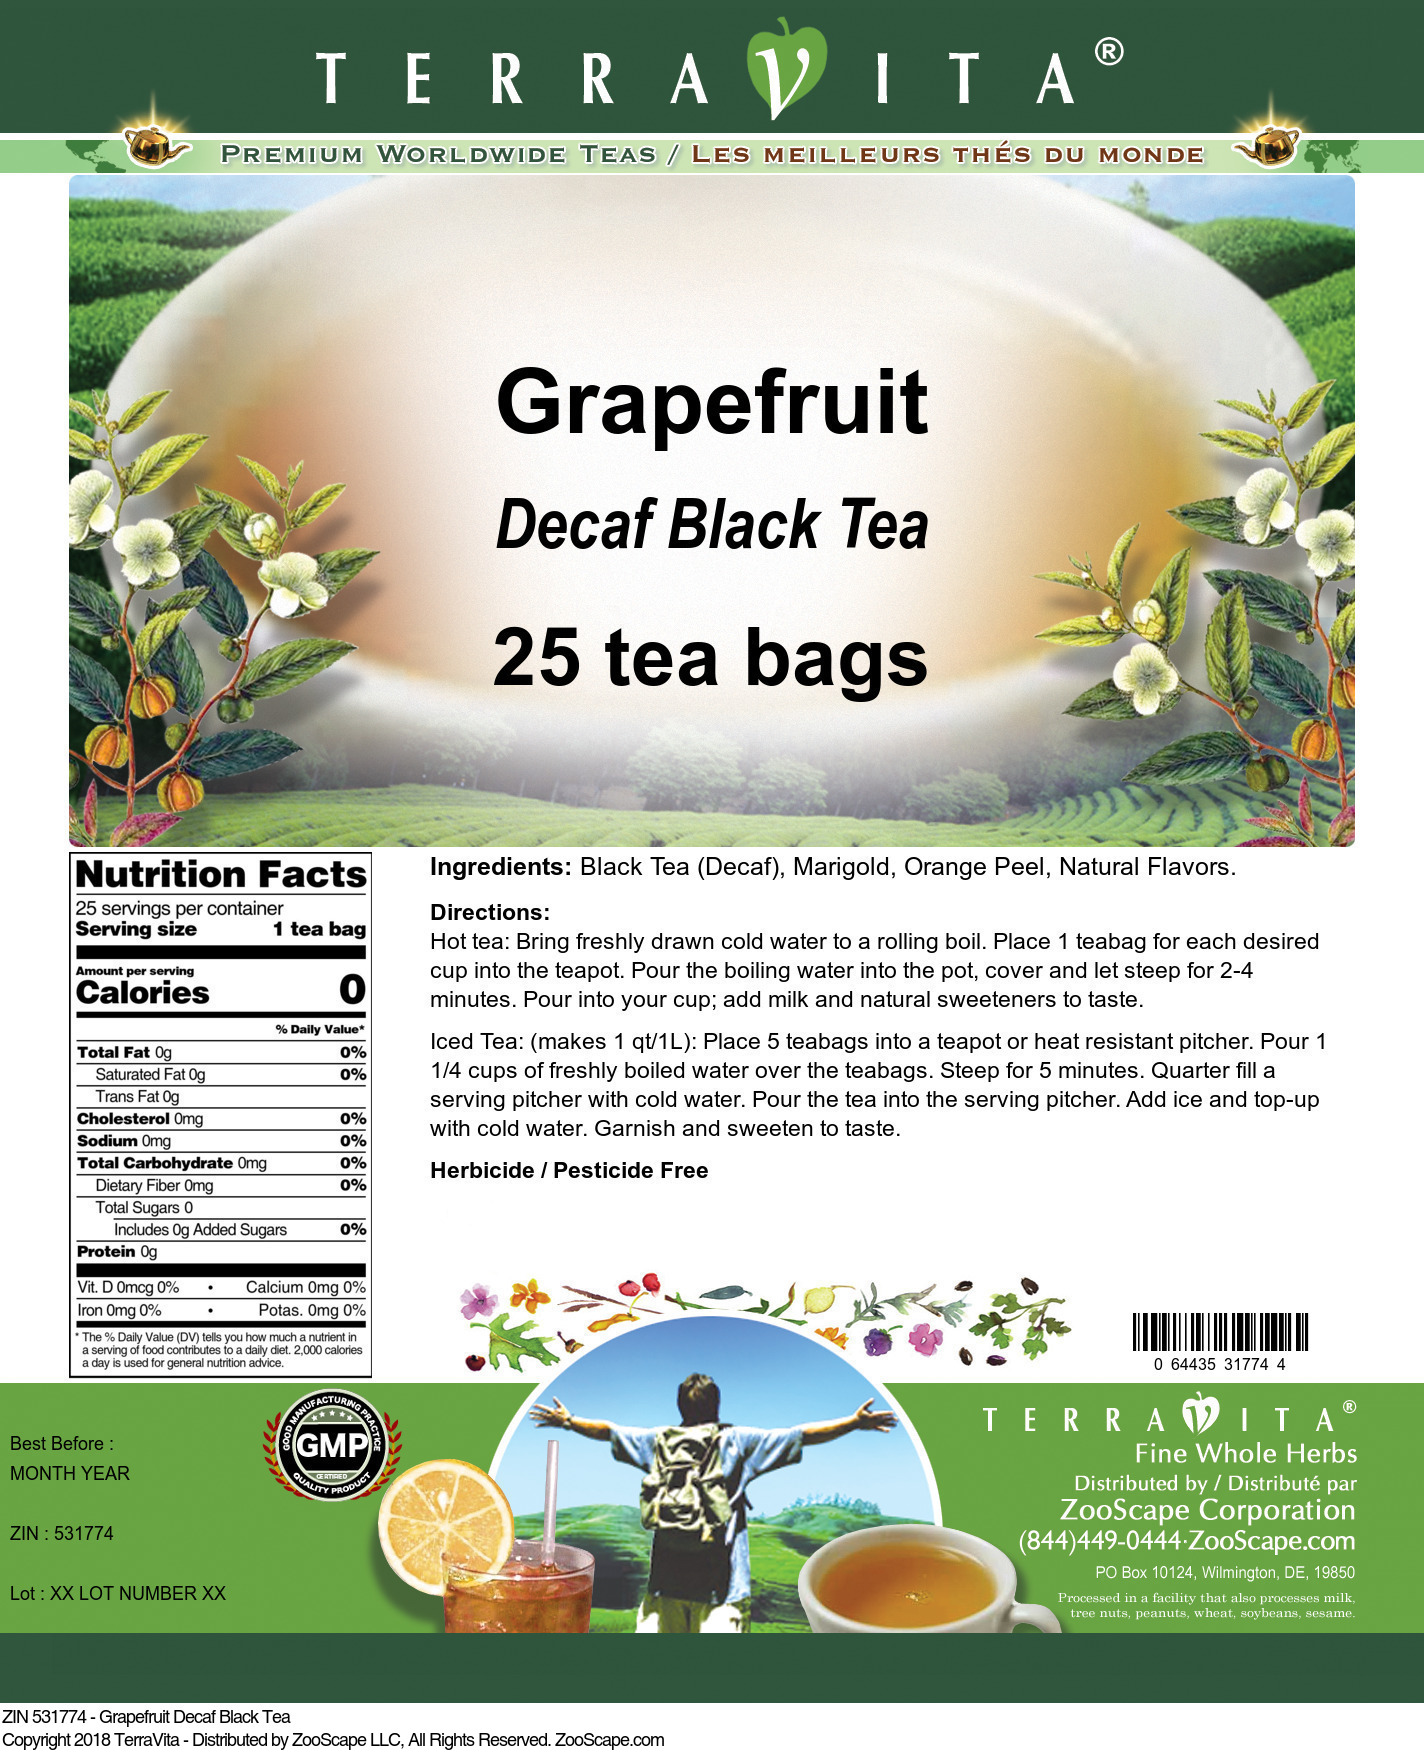 Grapefruit Decaf Black Tea